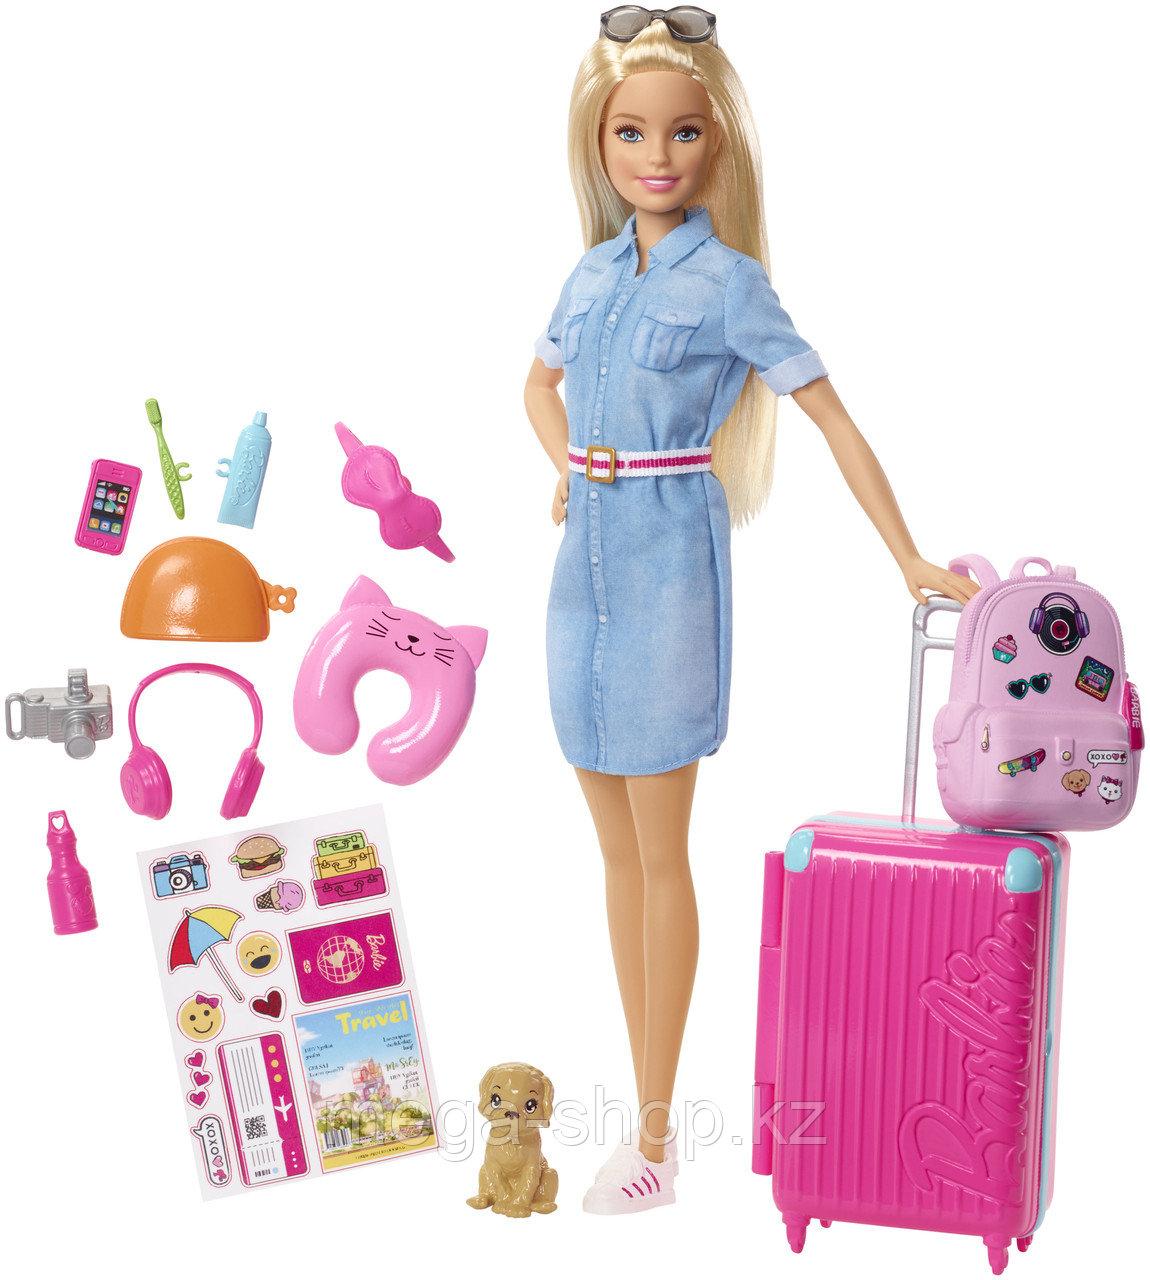 Mattel Barbie оригинал Барби Кукла из серии Путешествия - фото 1